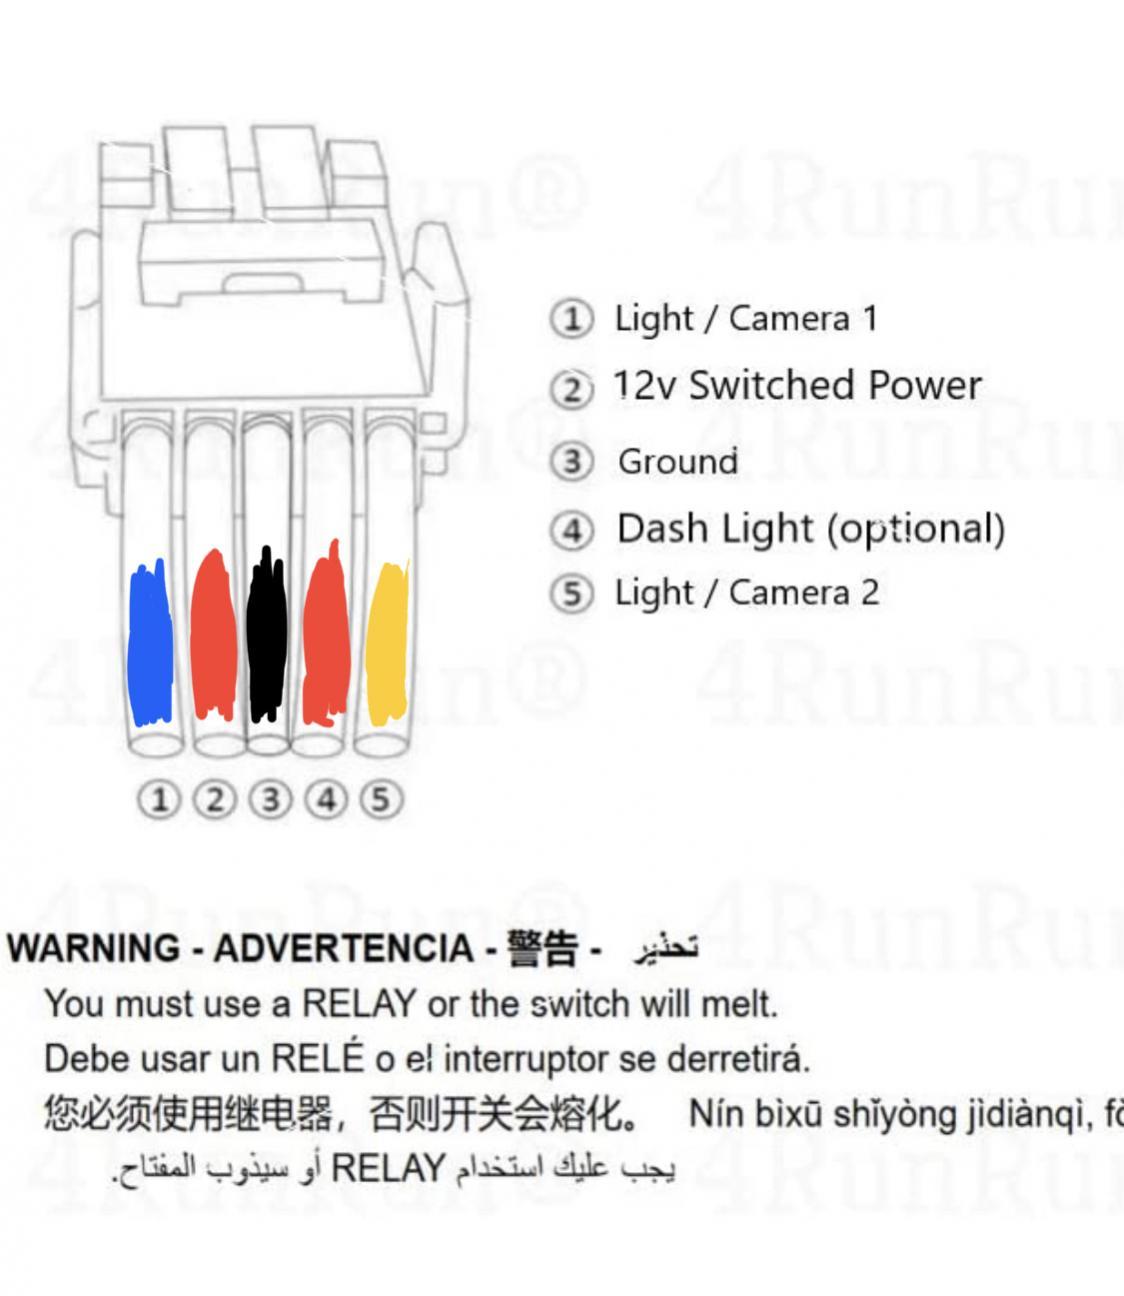 Lights Wiring-dd786a74-3086-4939-a9d0-c934c90036f5-jpg